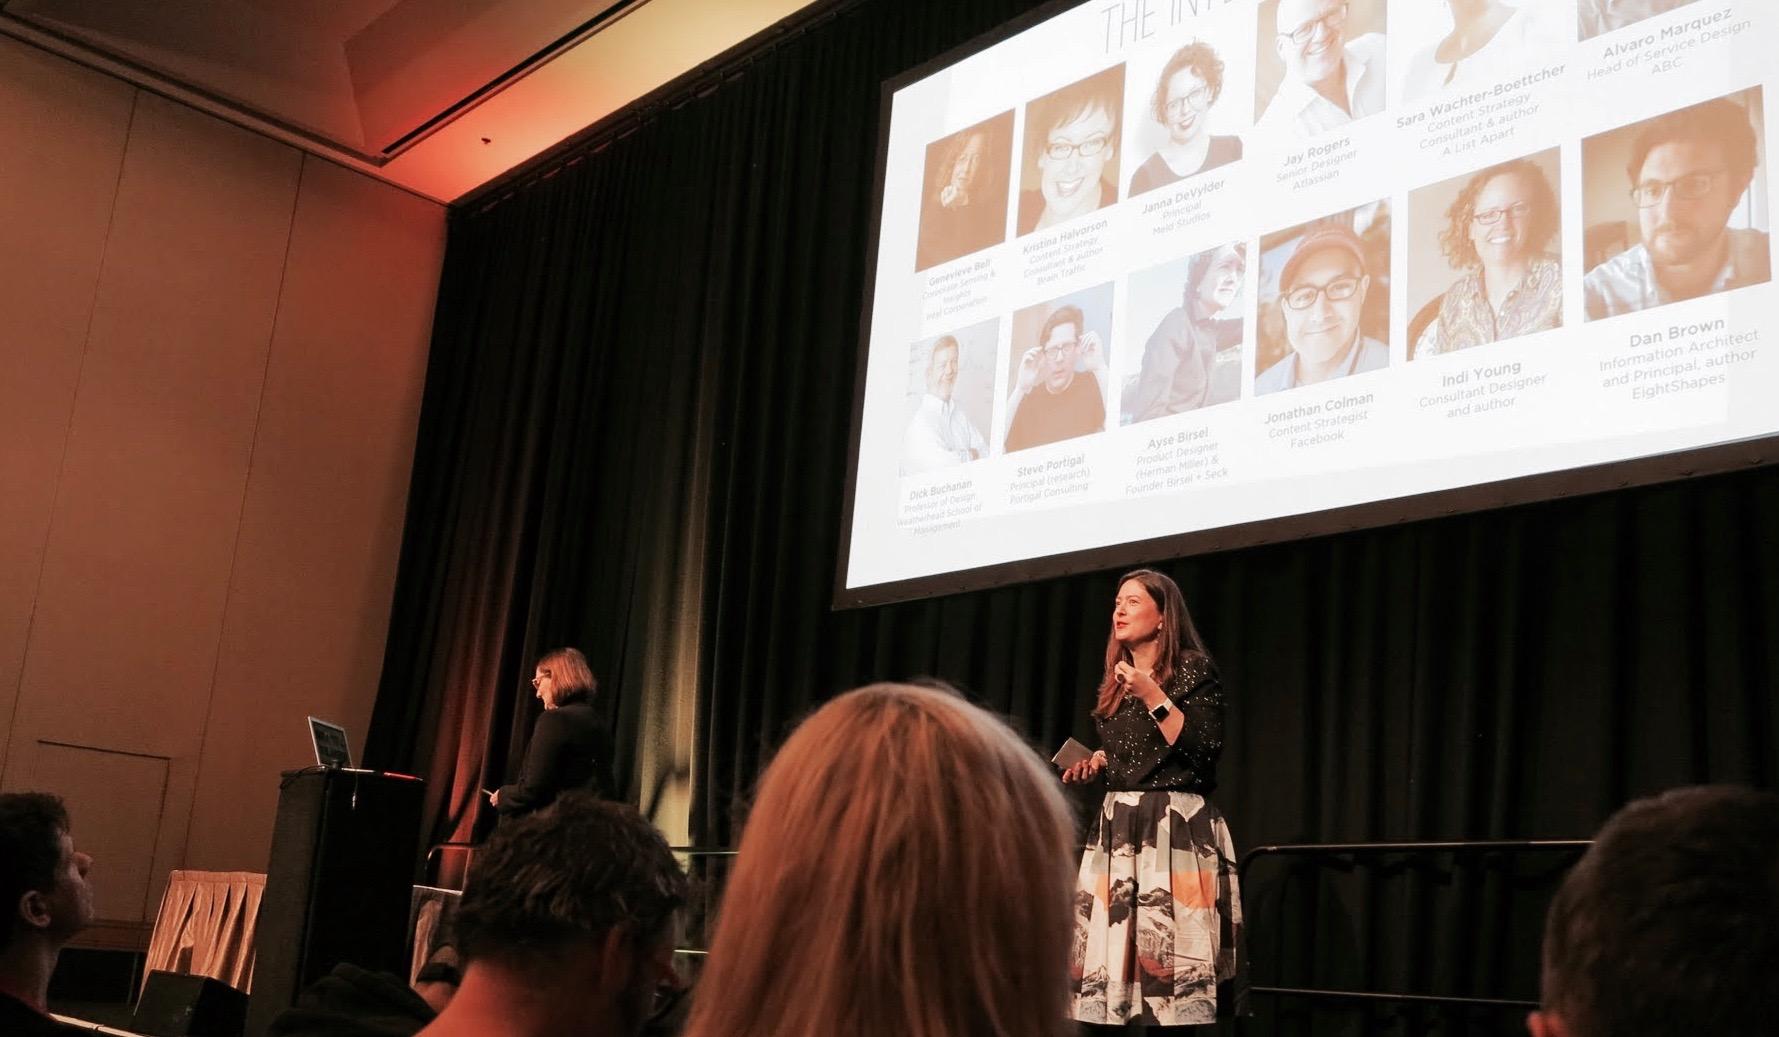 Presenting at UX Australia in August 2015 - Brisbane